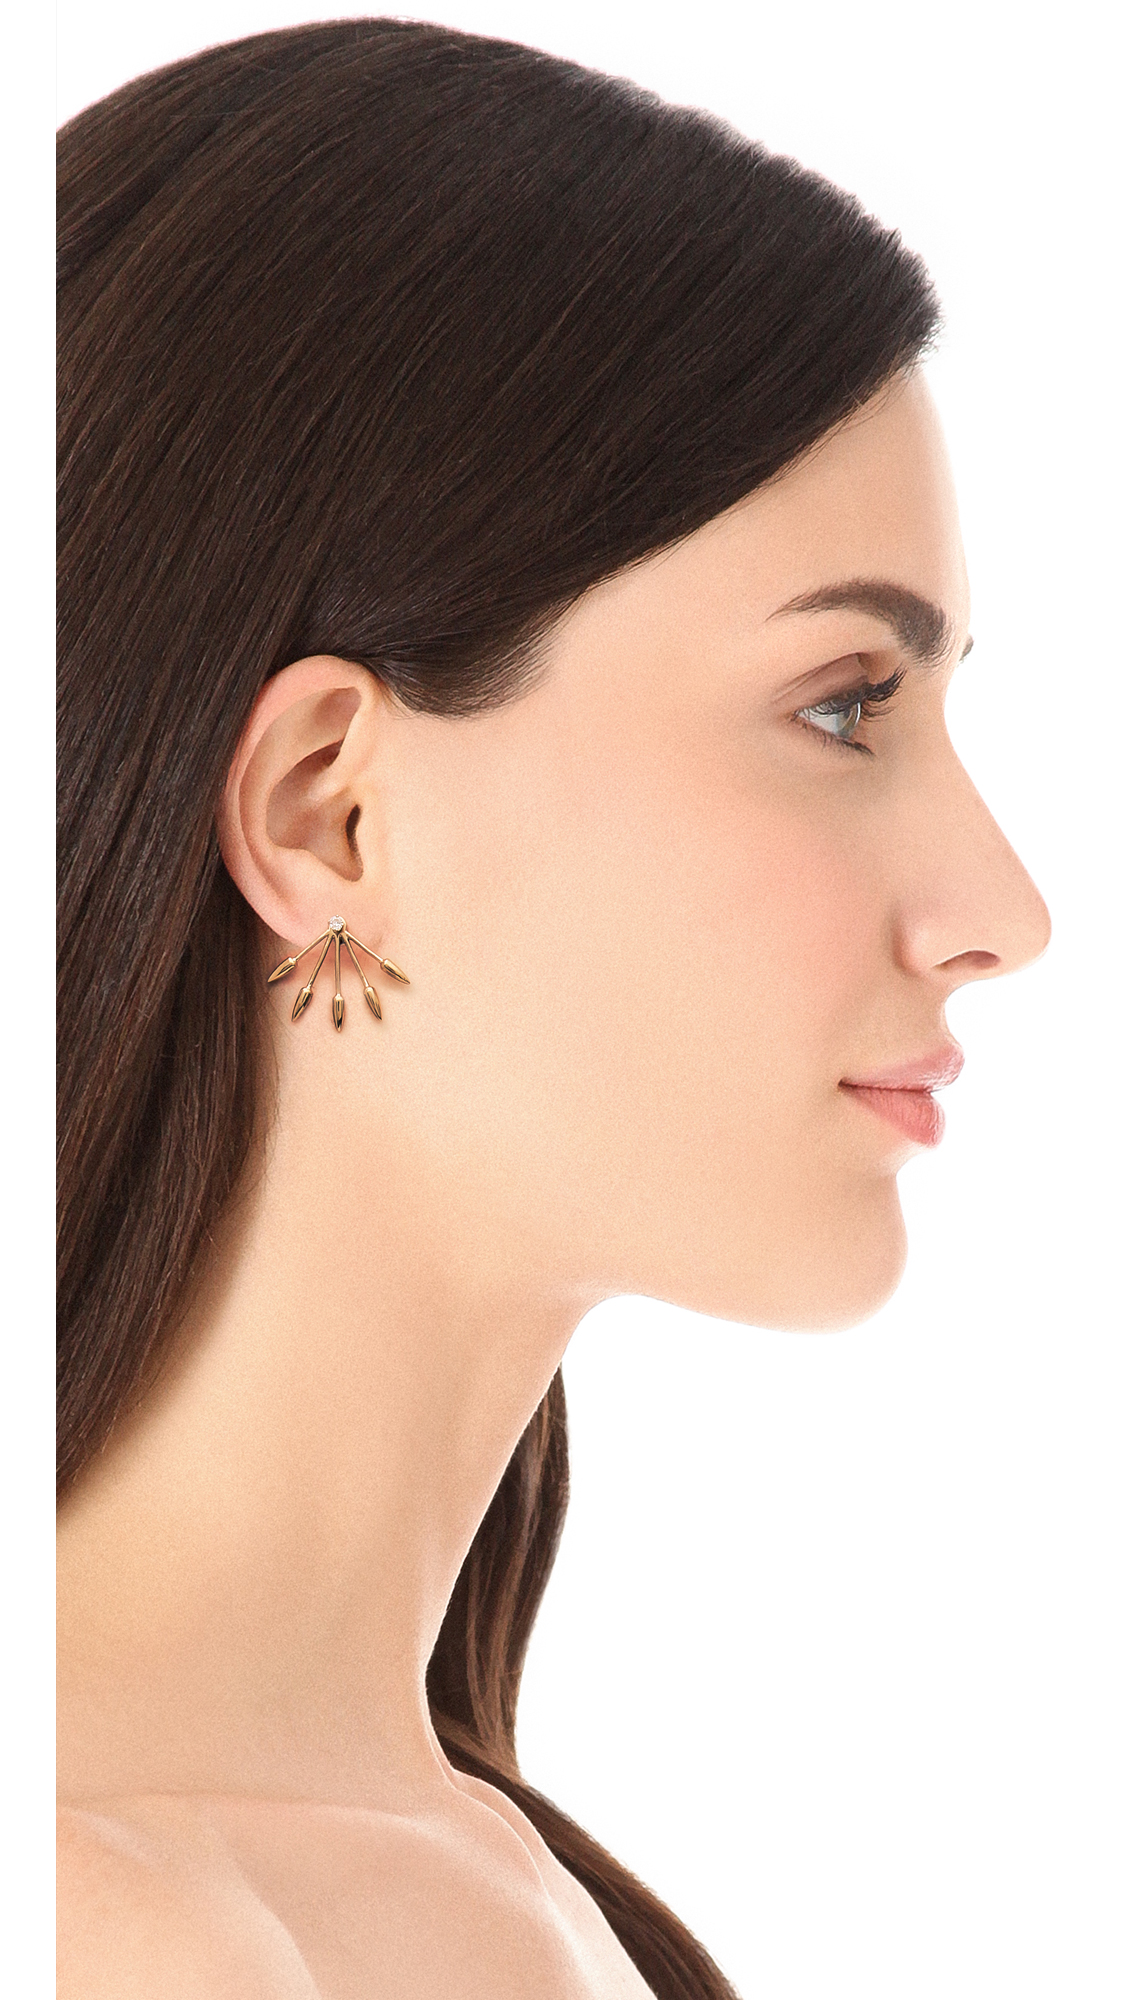 Pamela Love 5 Spike Earrings Uk Best All Earring Photos